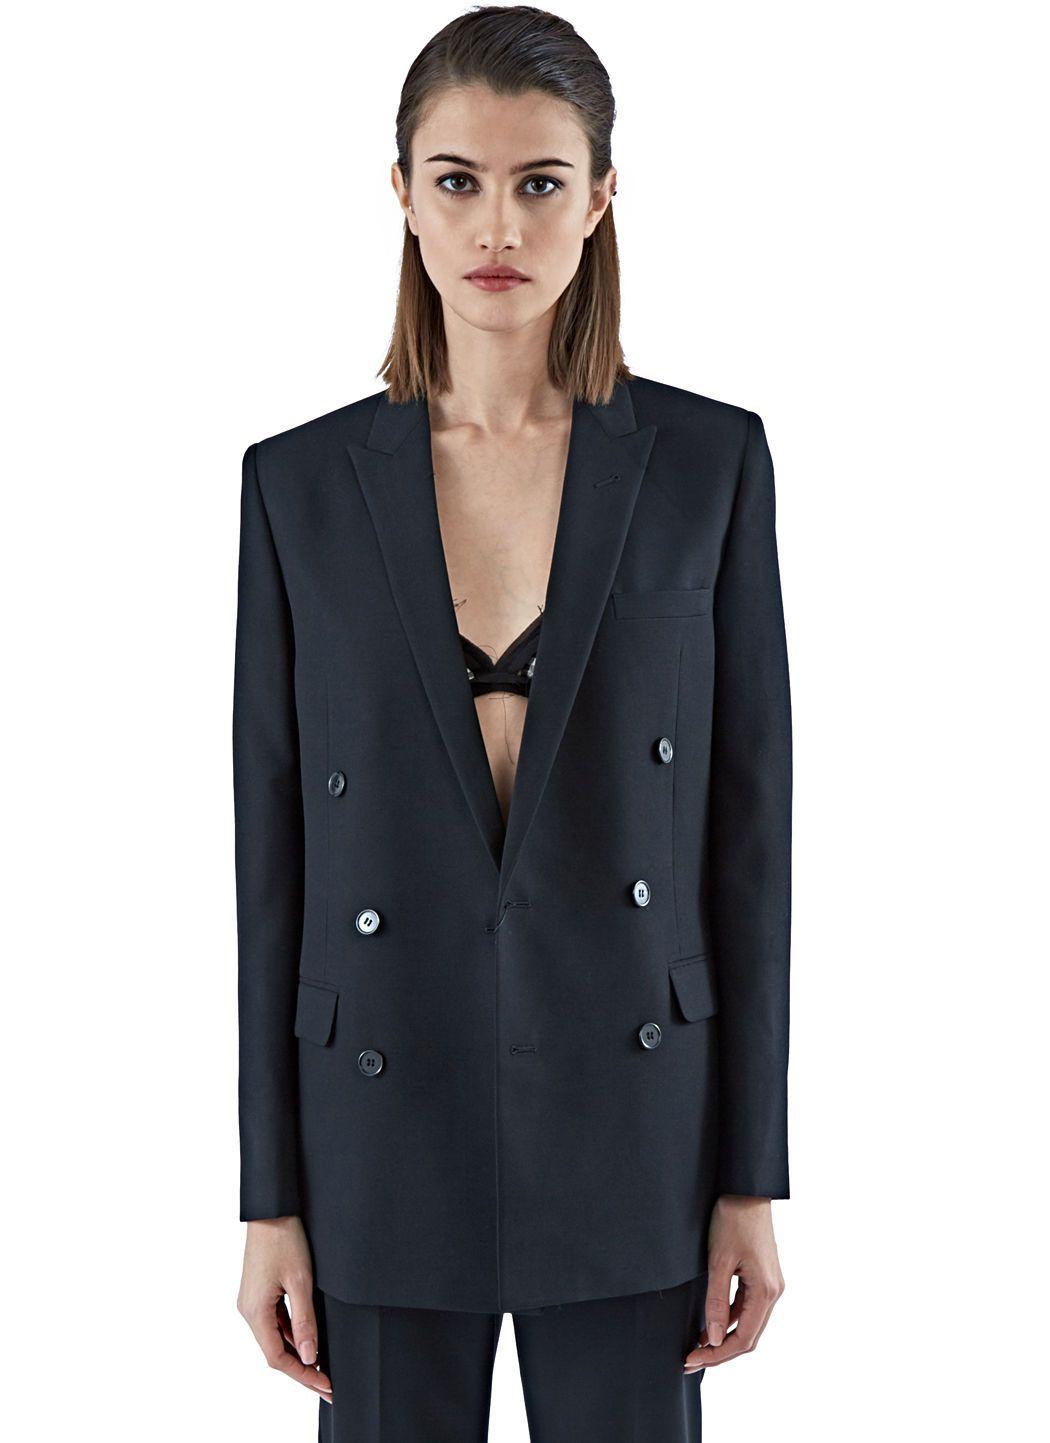 Saint Laurent Women S Double Breasted Tuxedo Jacket In Black